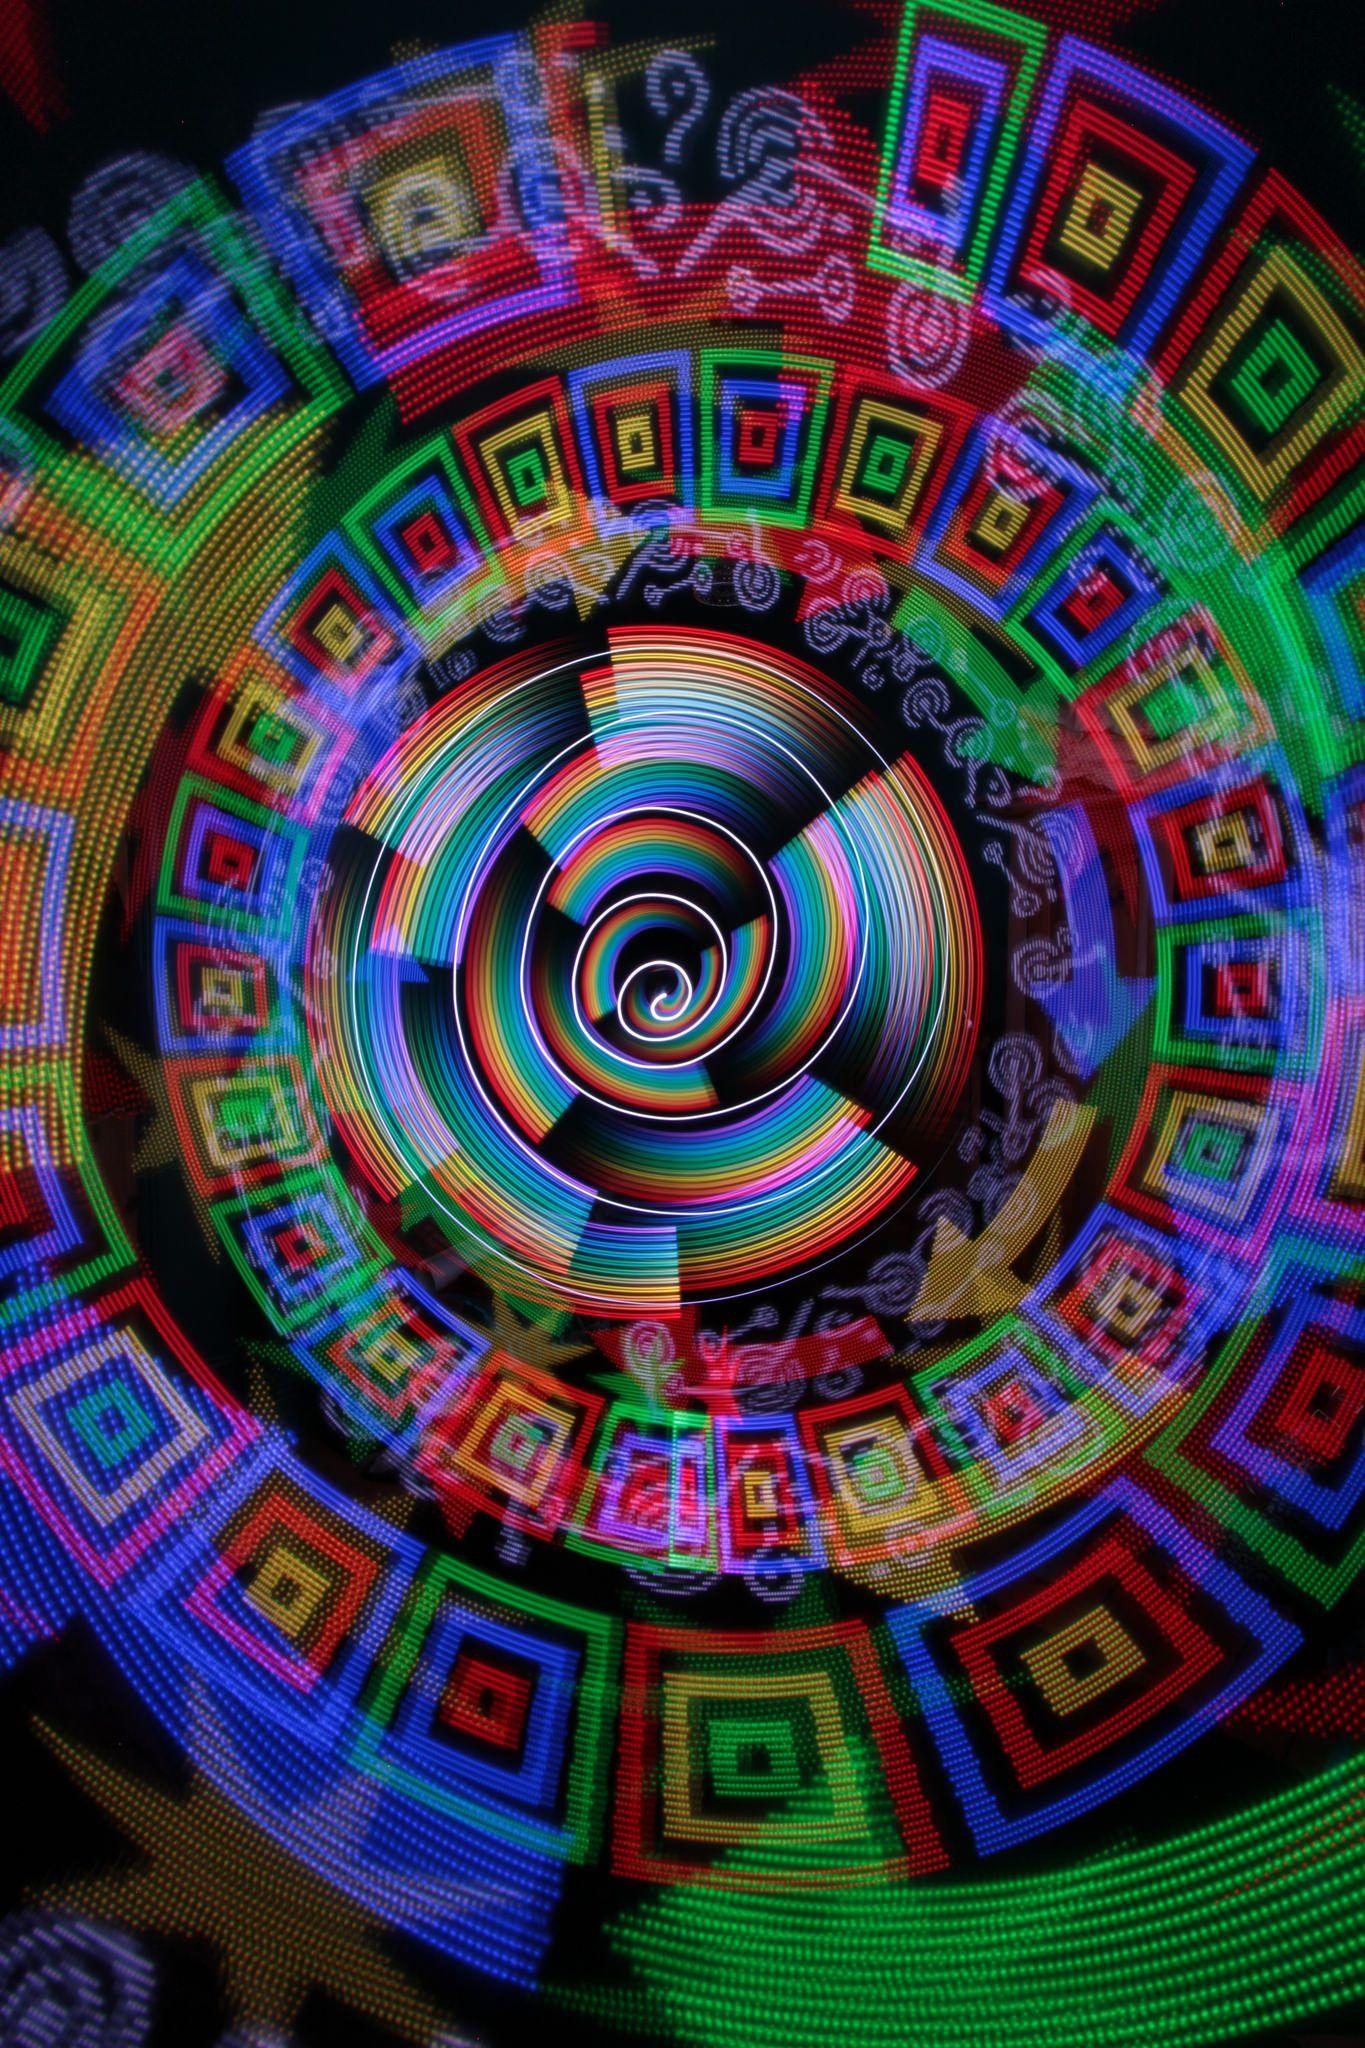 5d3822c4d58647fa46b84a193c7a59ca Fabelhafte Led Flex Lichtleisten Set Dekorationen